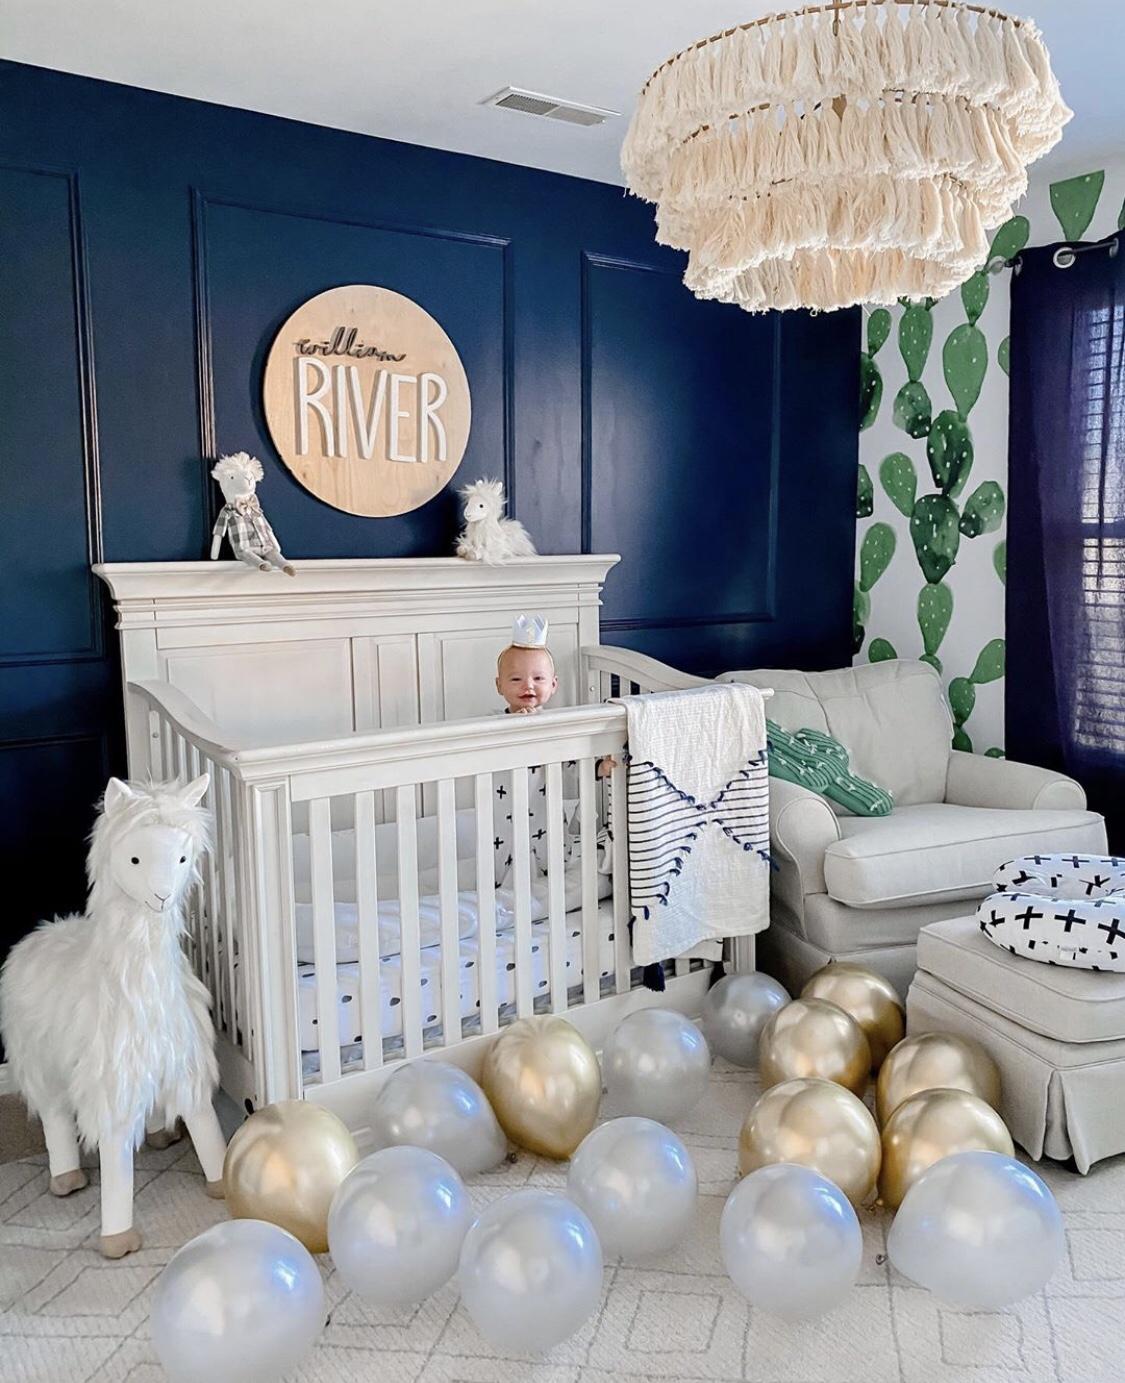 boy nursery dark blue wall white crib white cot llama